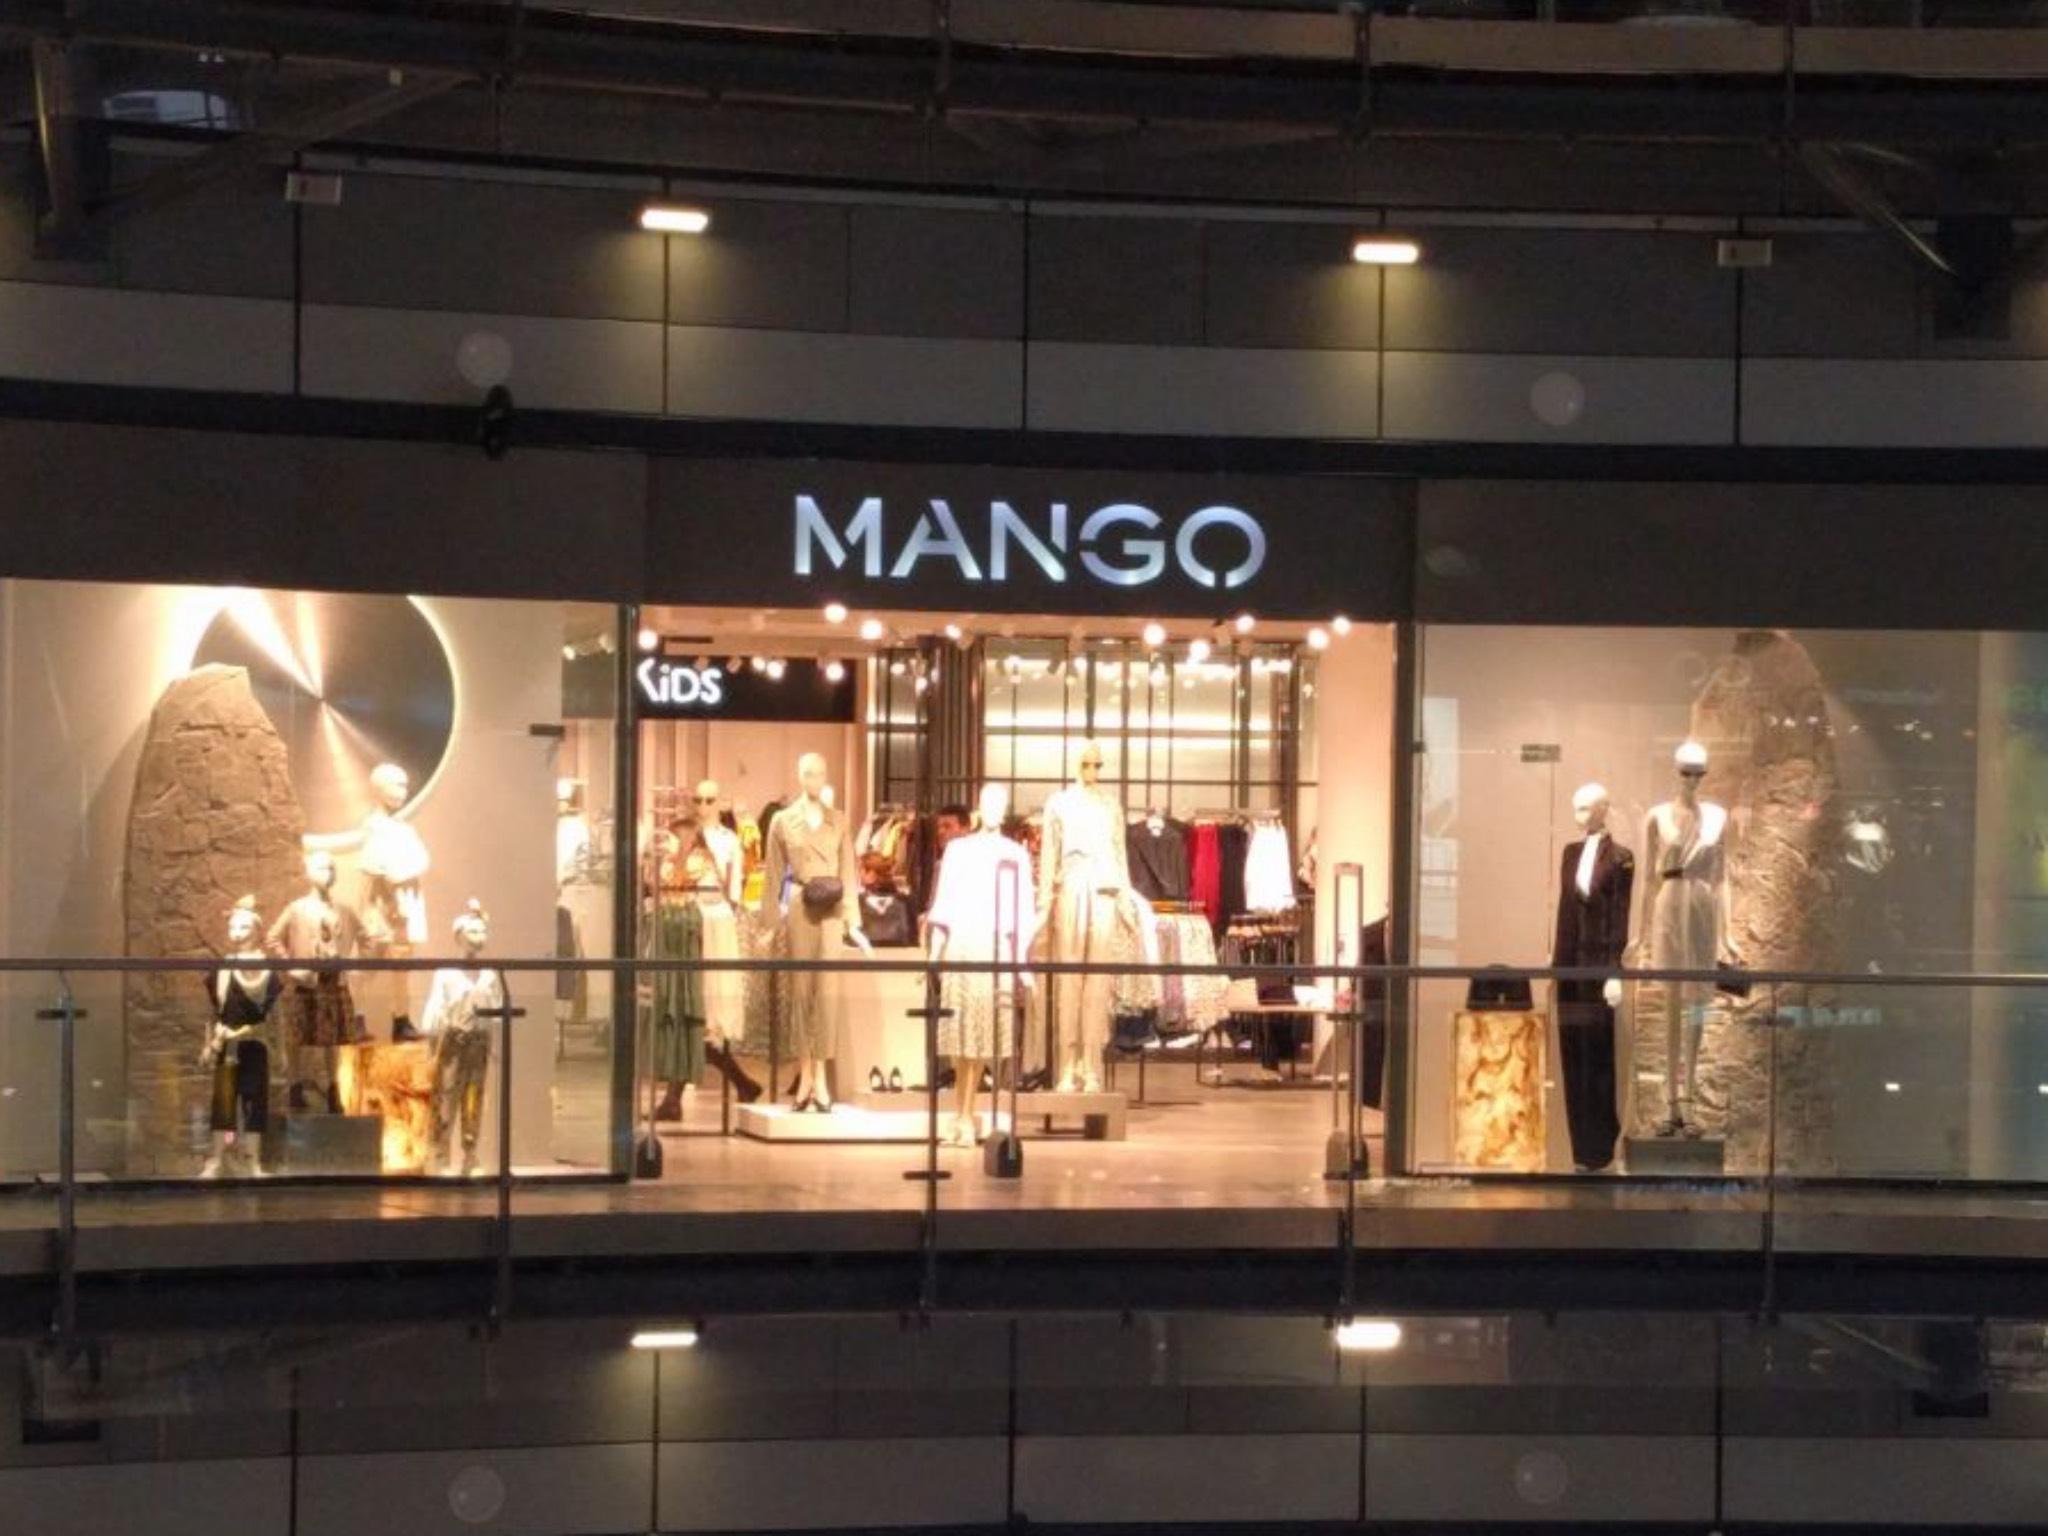 Mango outlet